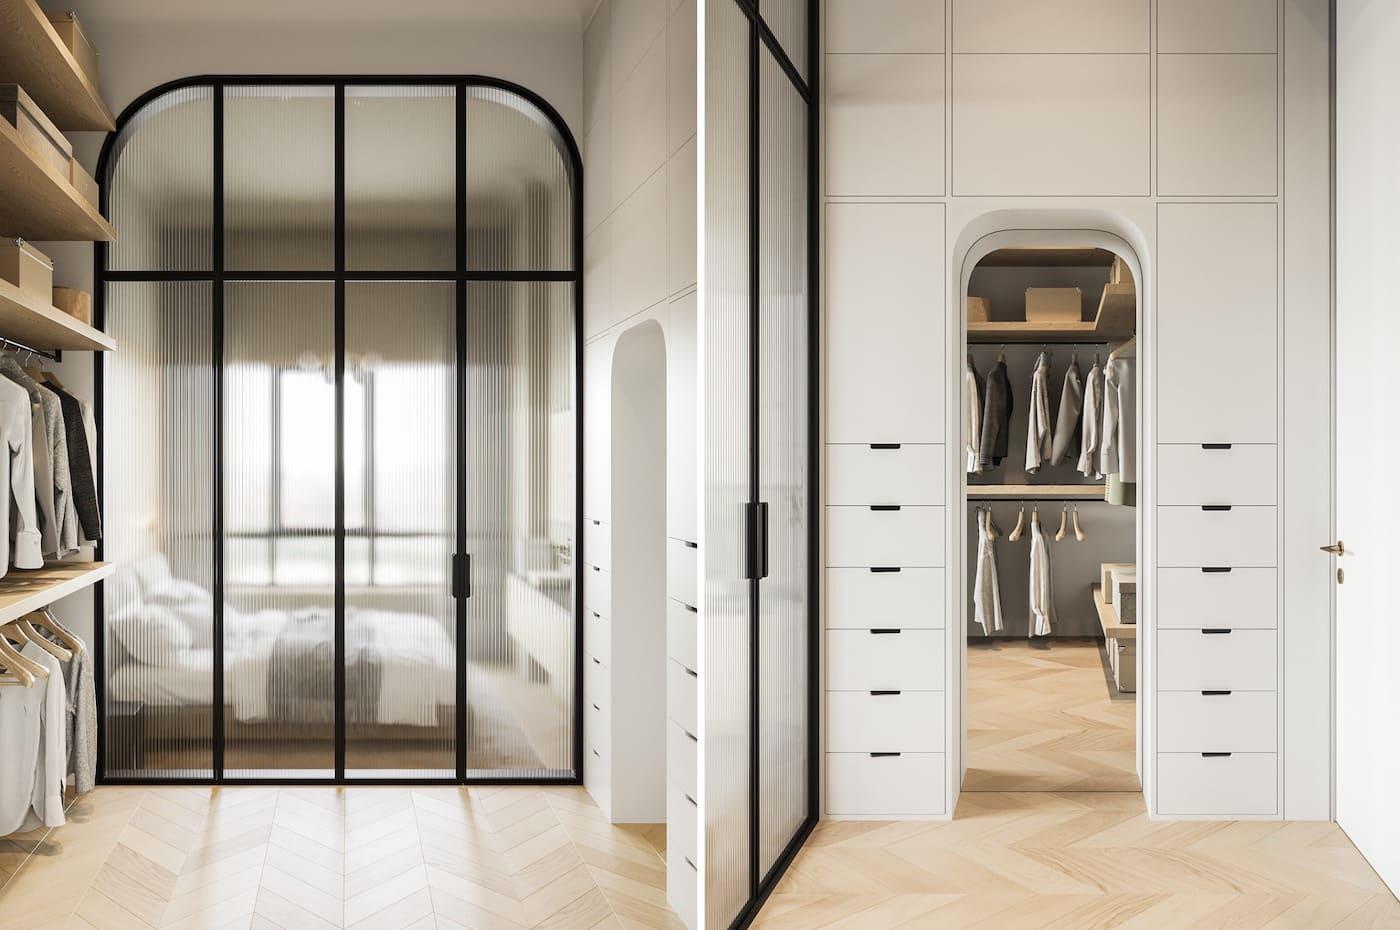 дизайн интерьера модной квартиры фото 30